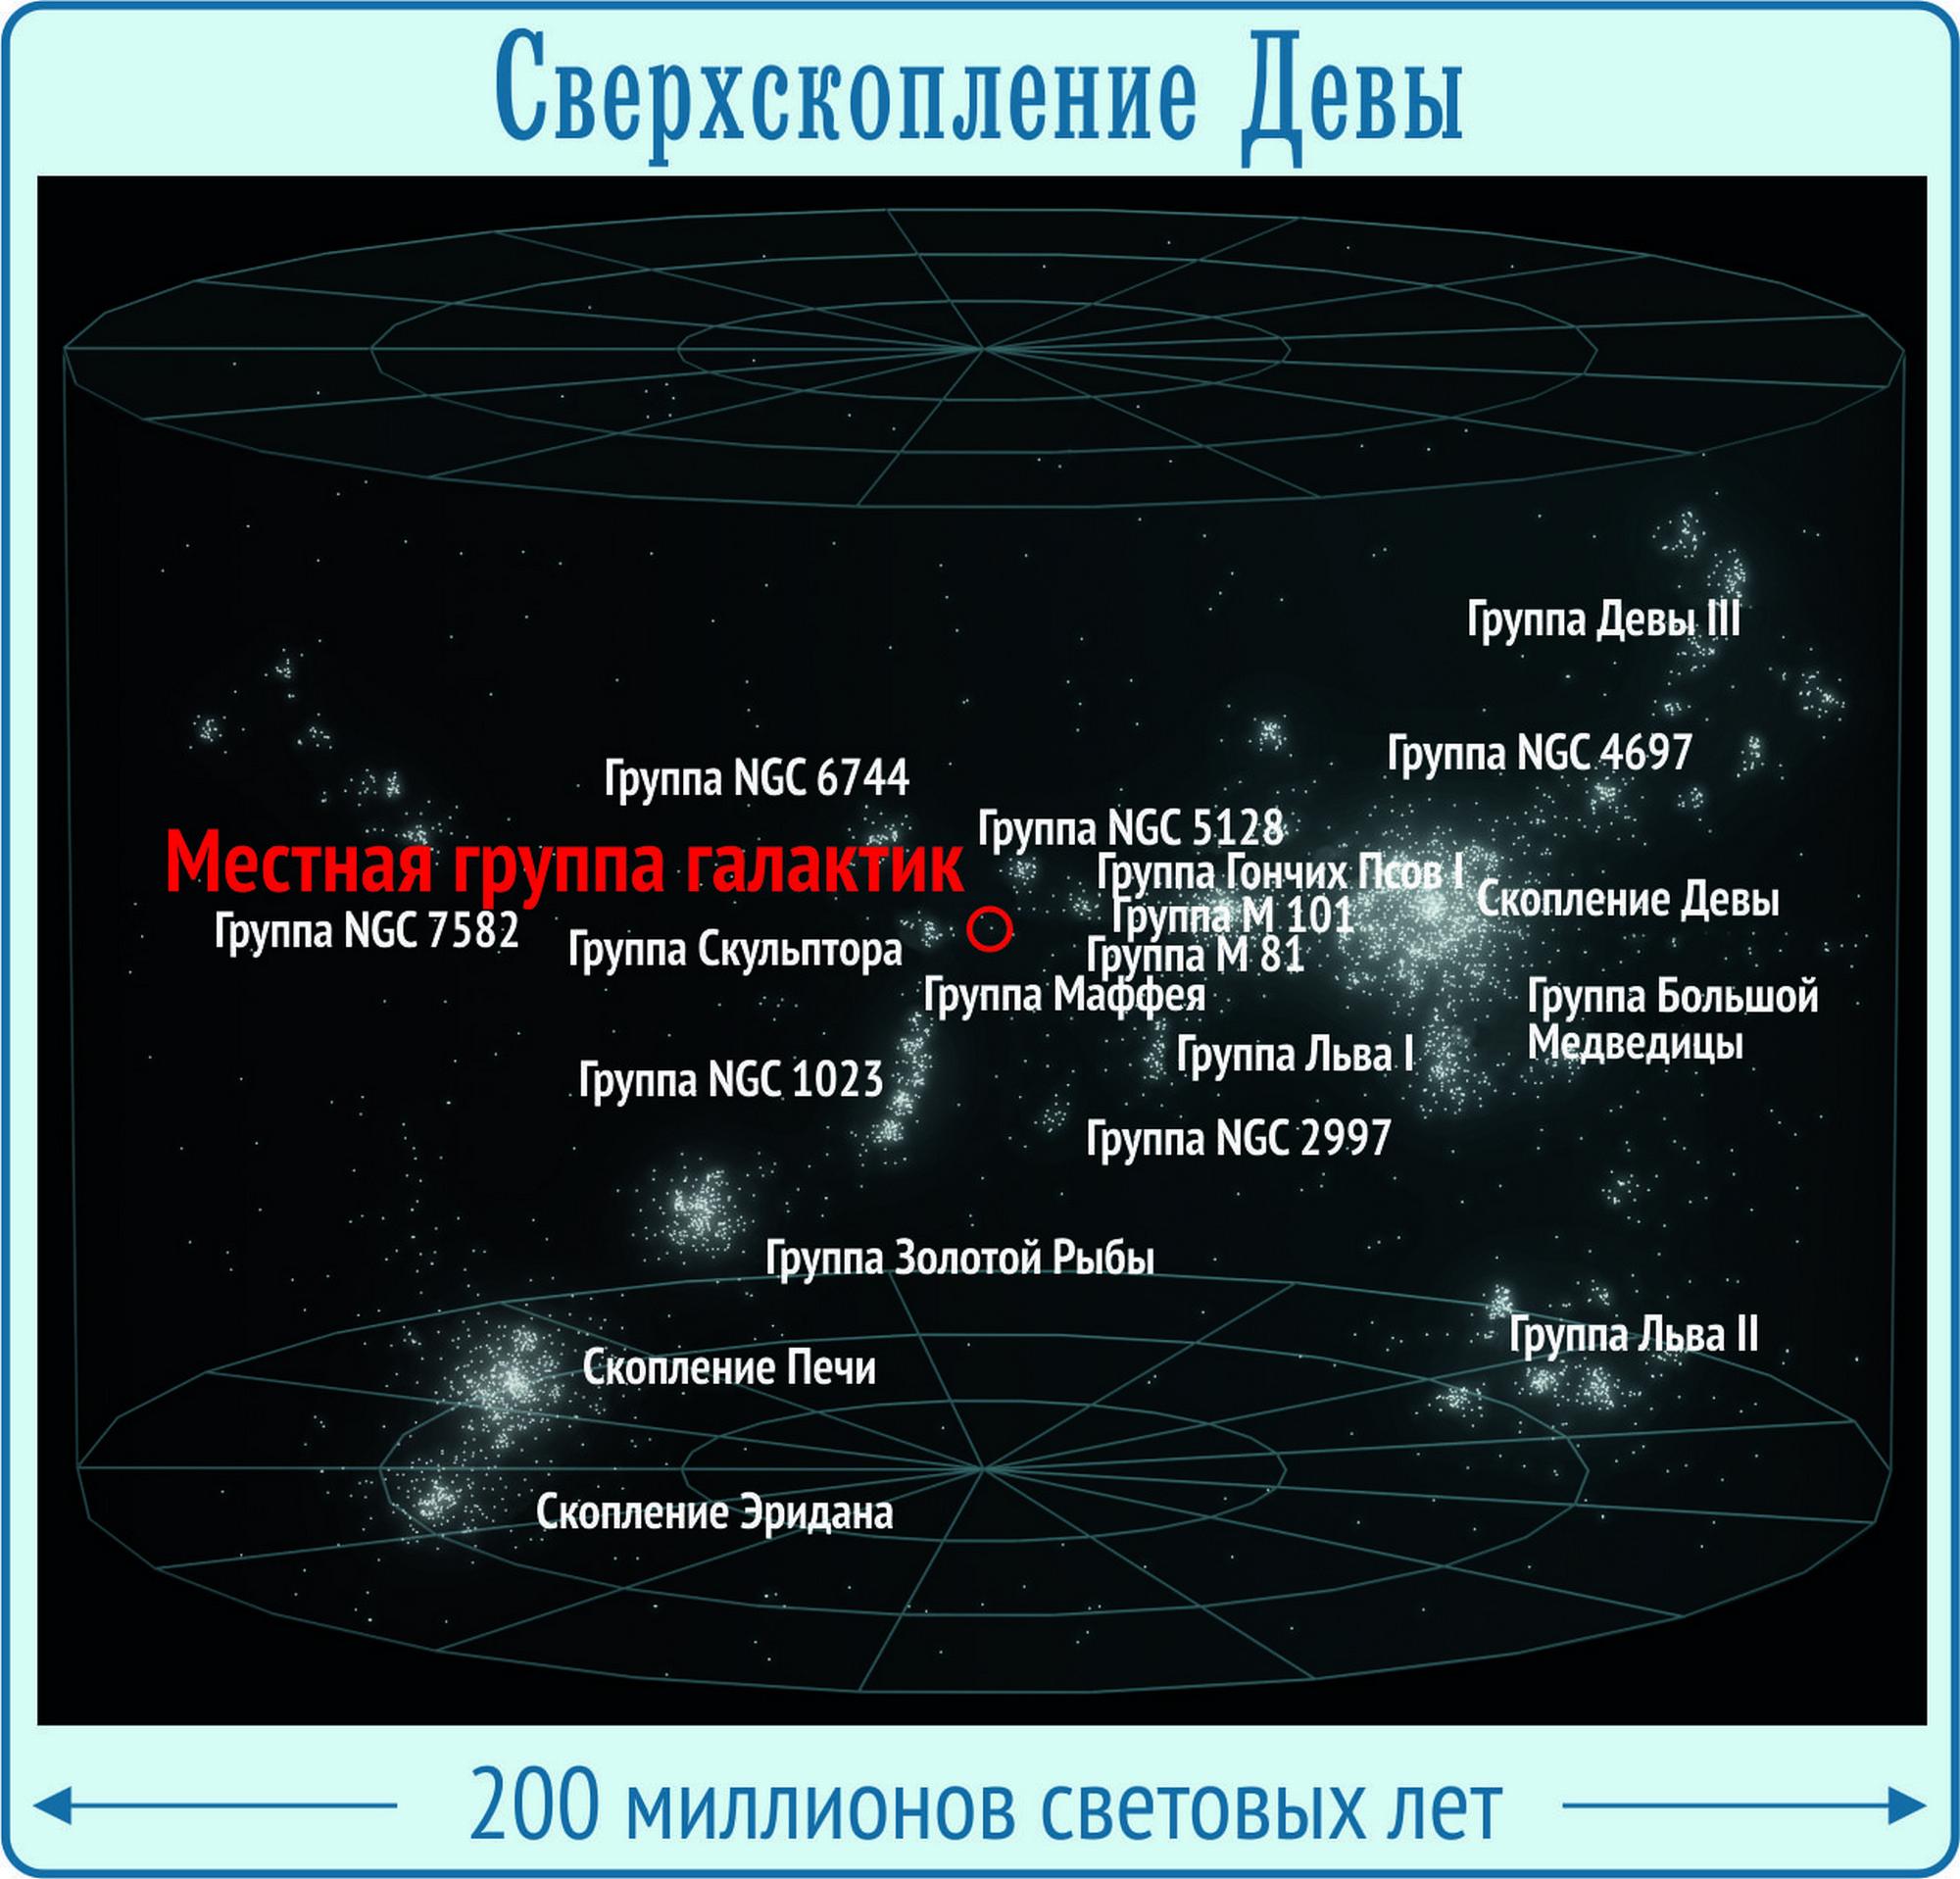 virgo supercluster vs laniakea supercluster - HD2000×1917